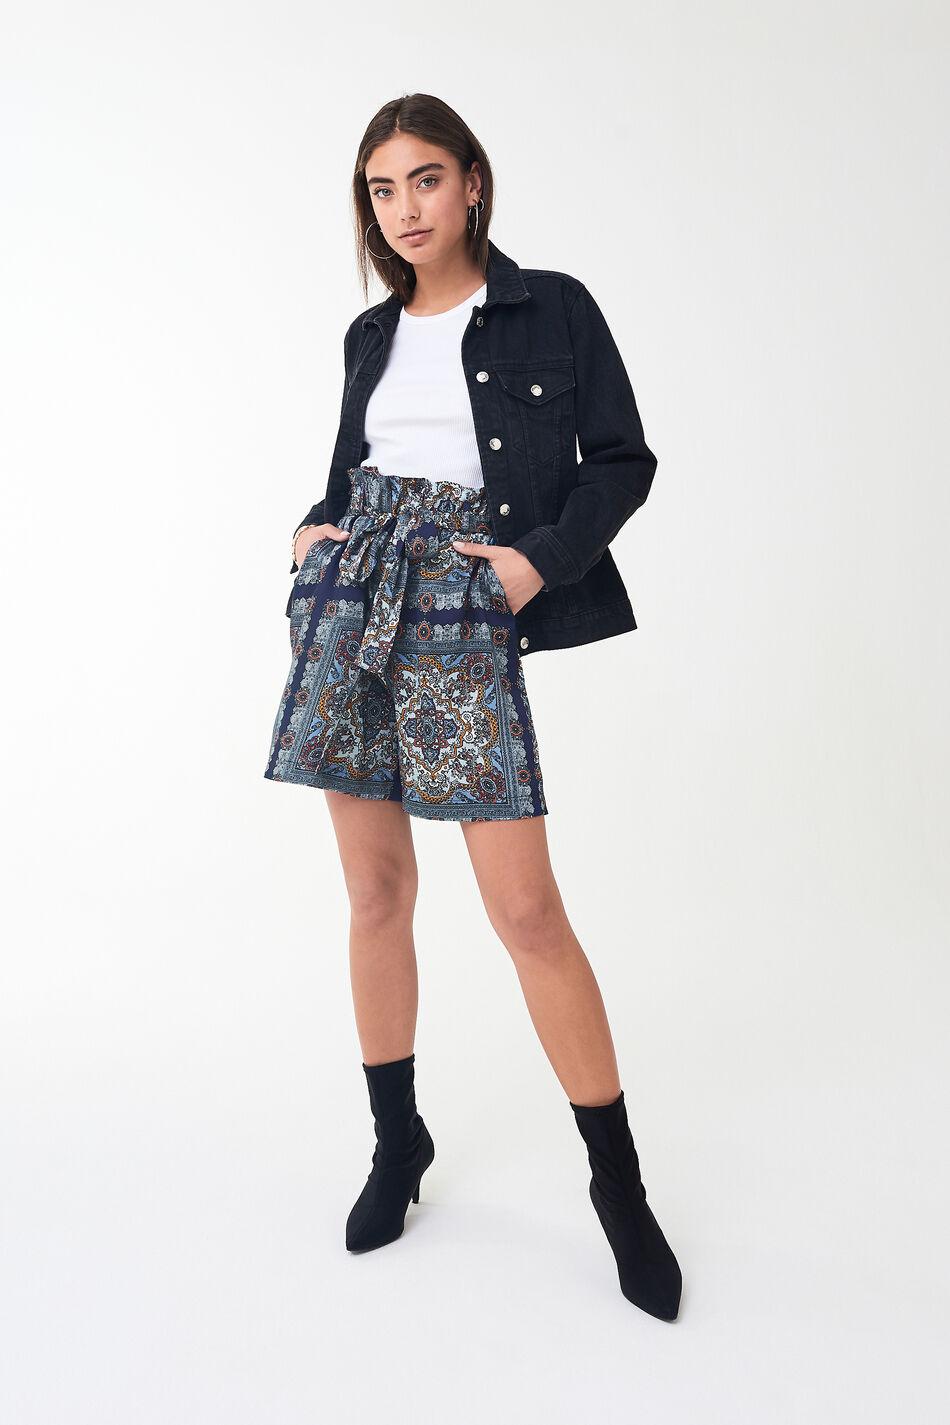 Gina Tricot Corinne shorts